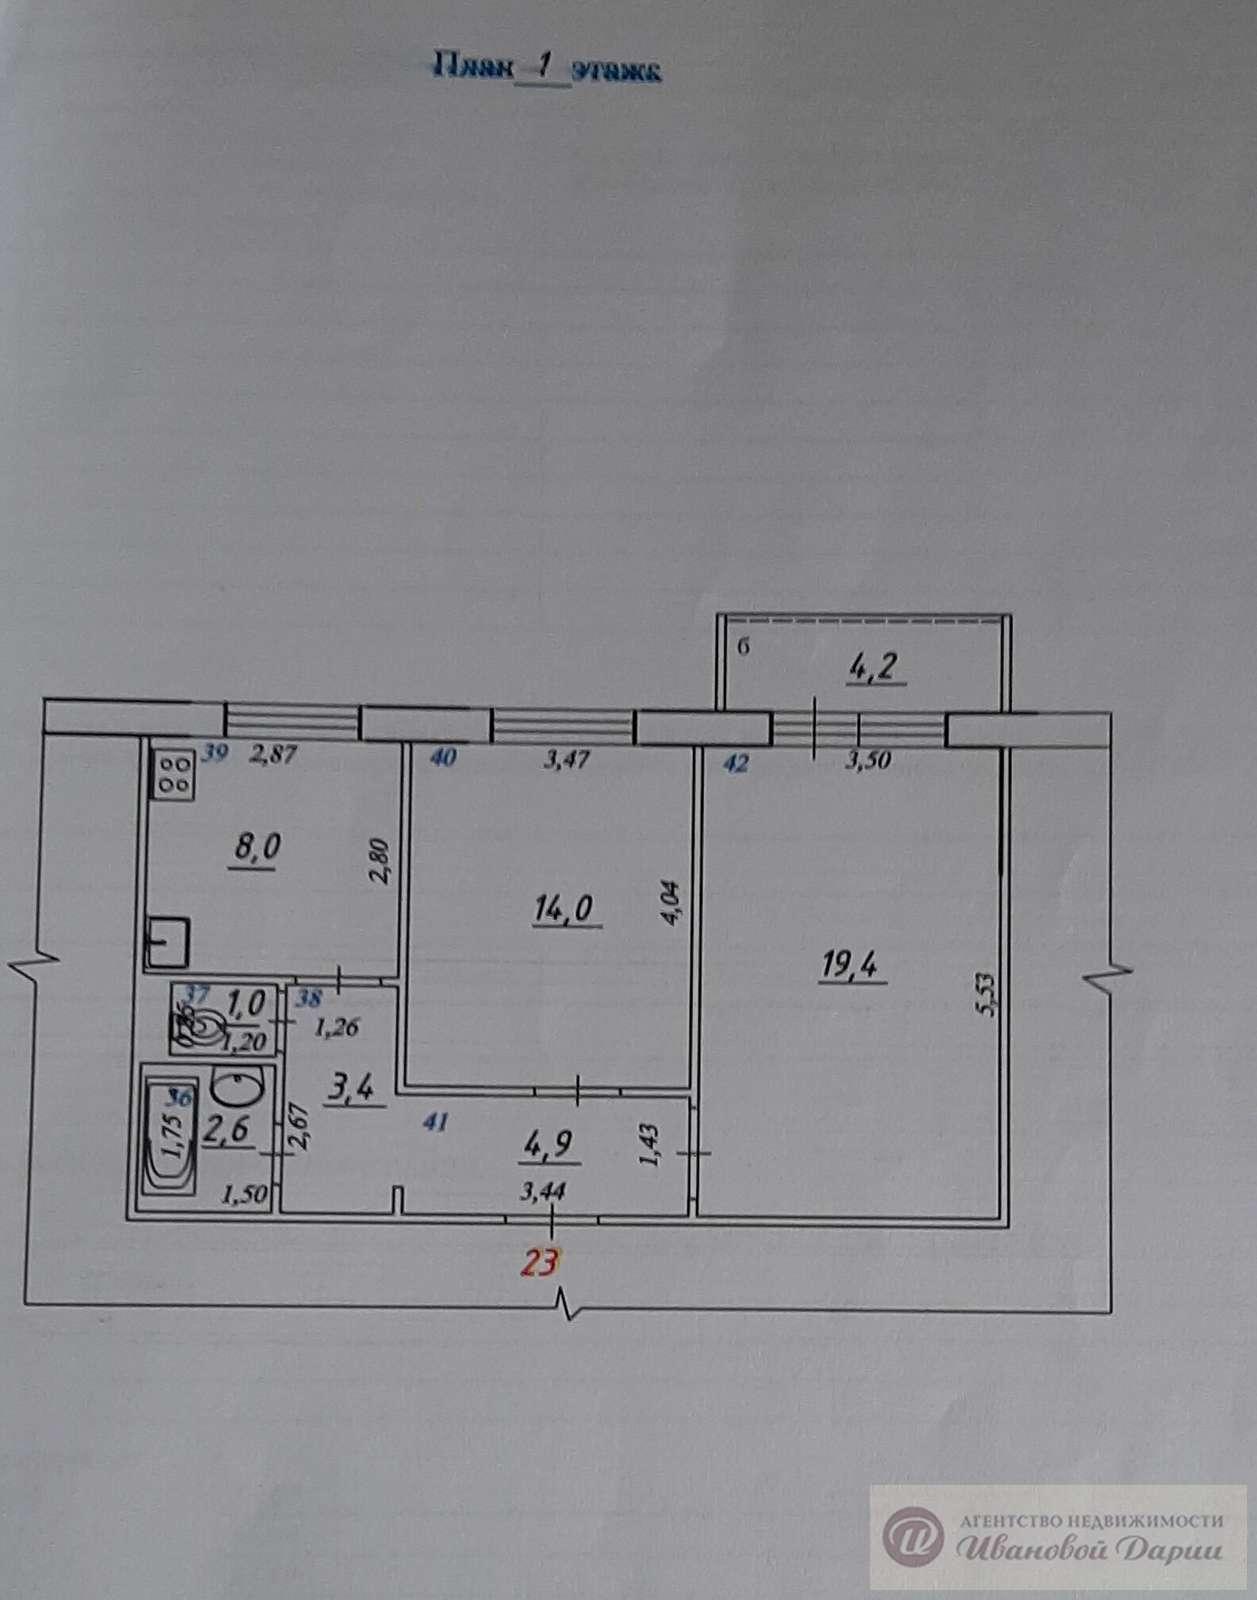 Продажа 2-комнатной квартиры, Самара, Егорова улица,  дом 5